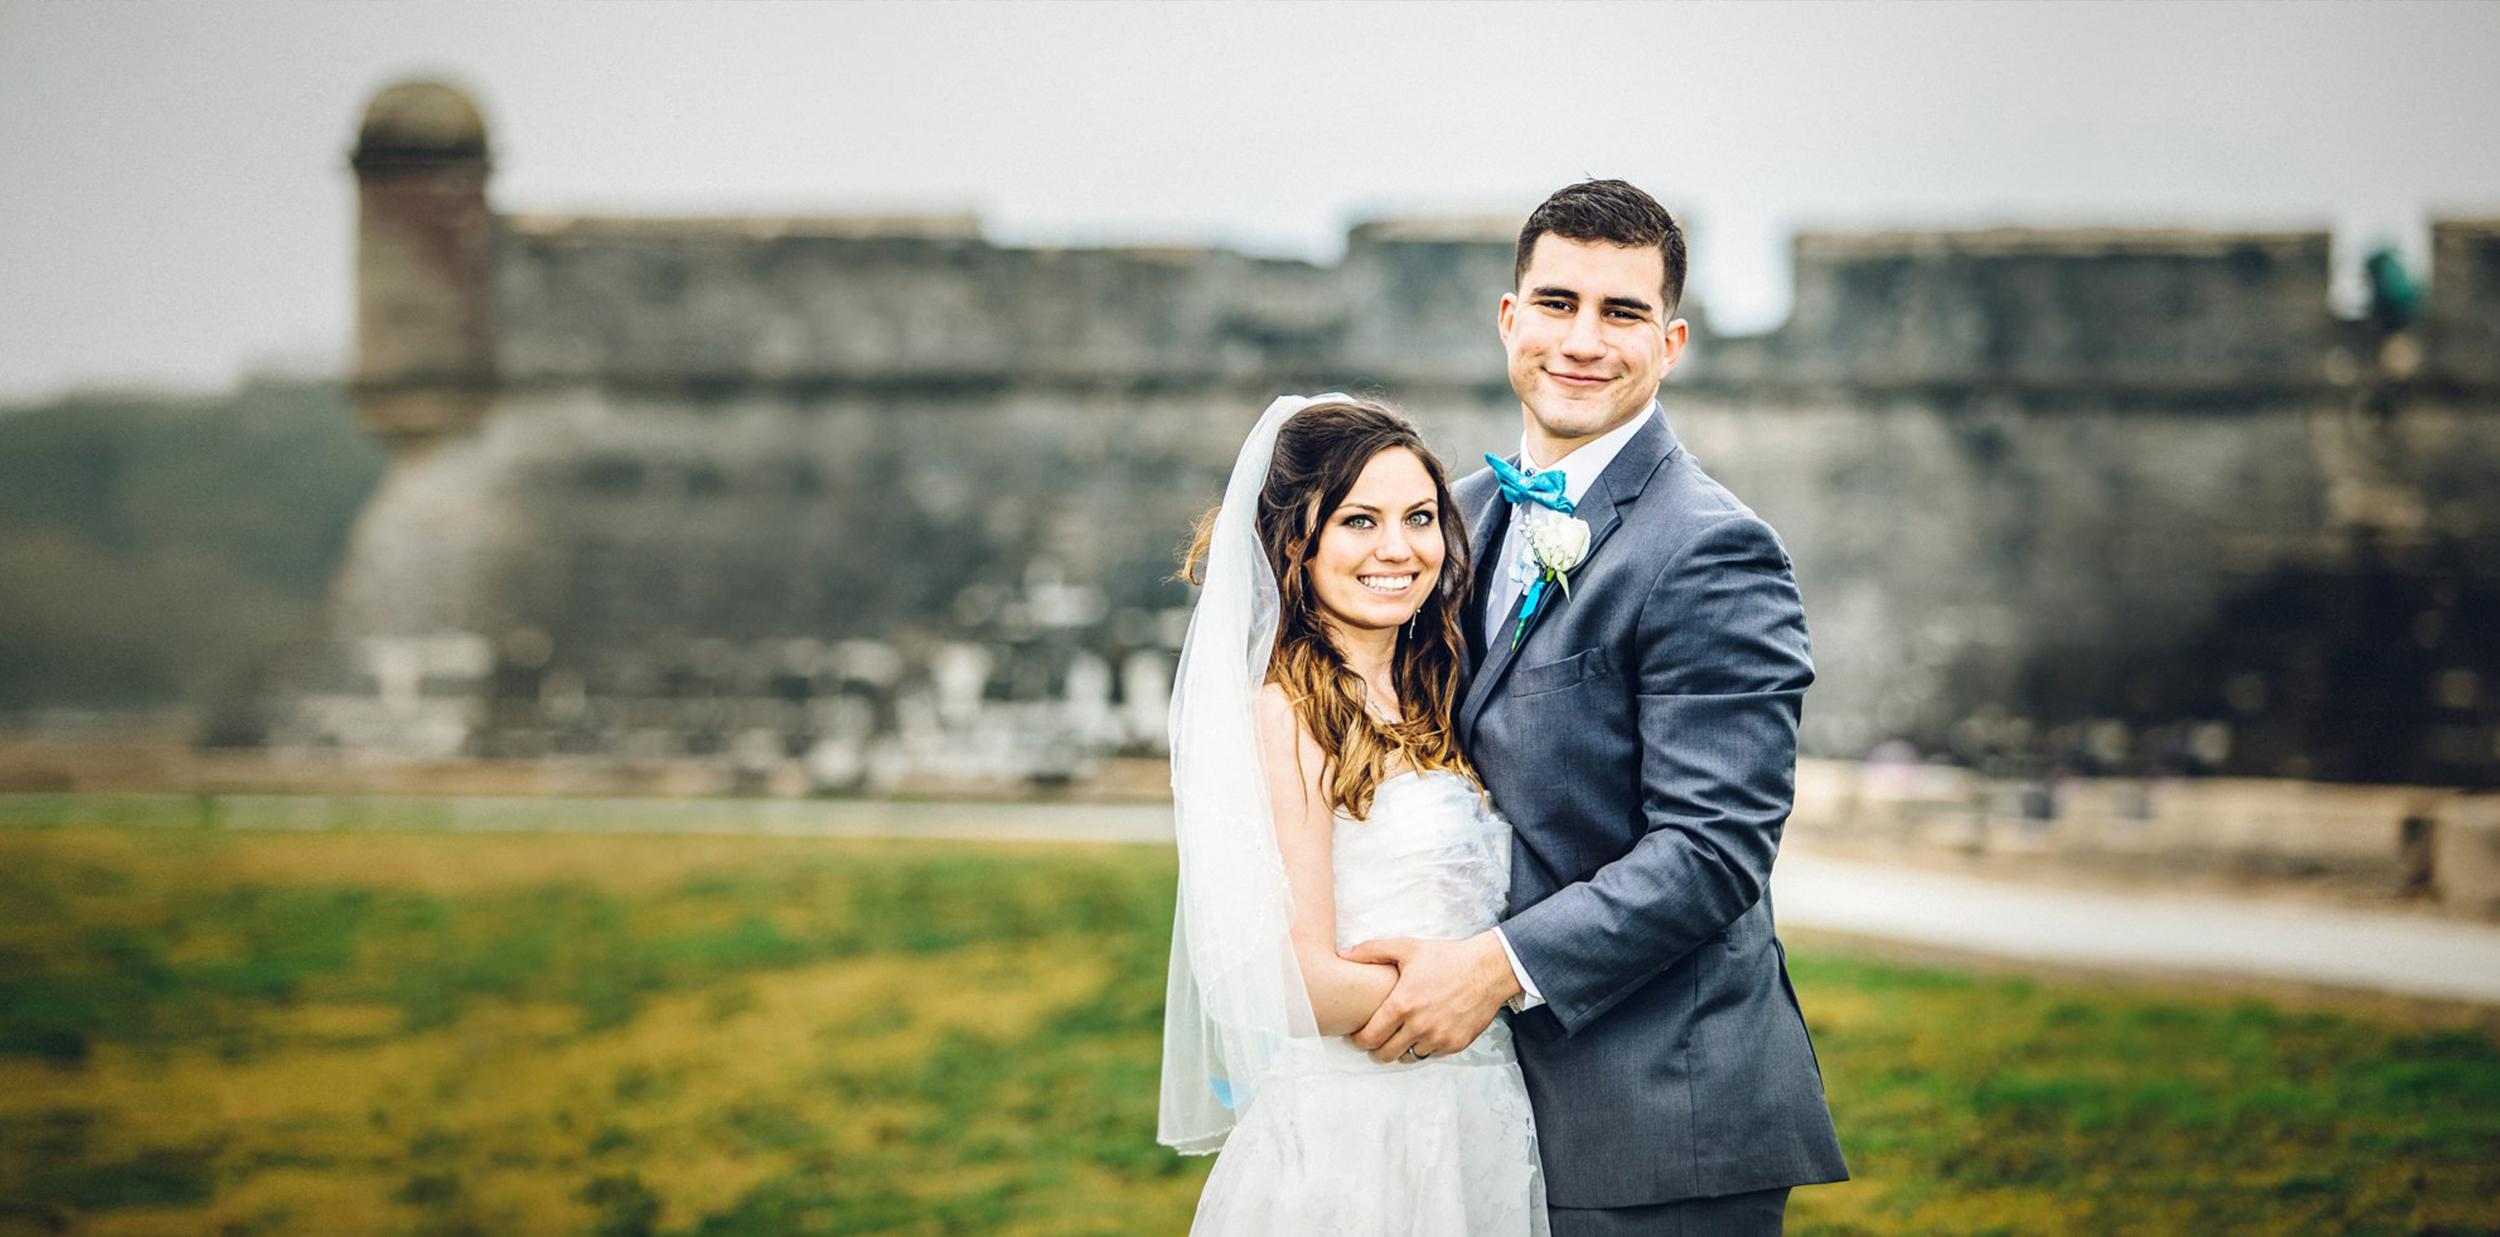 Joao Nicole st augustine castillo de san marco florida wedding.jpg